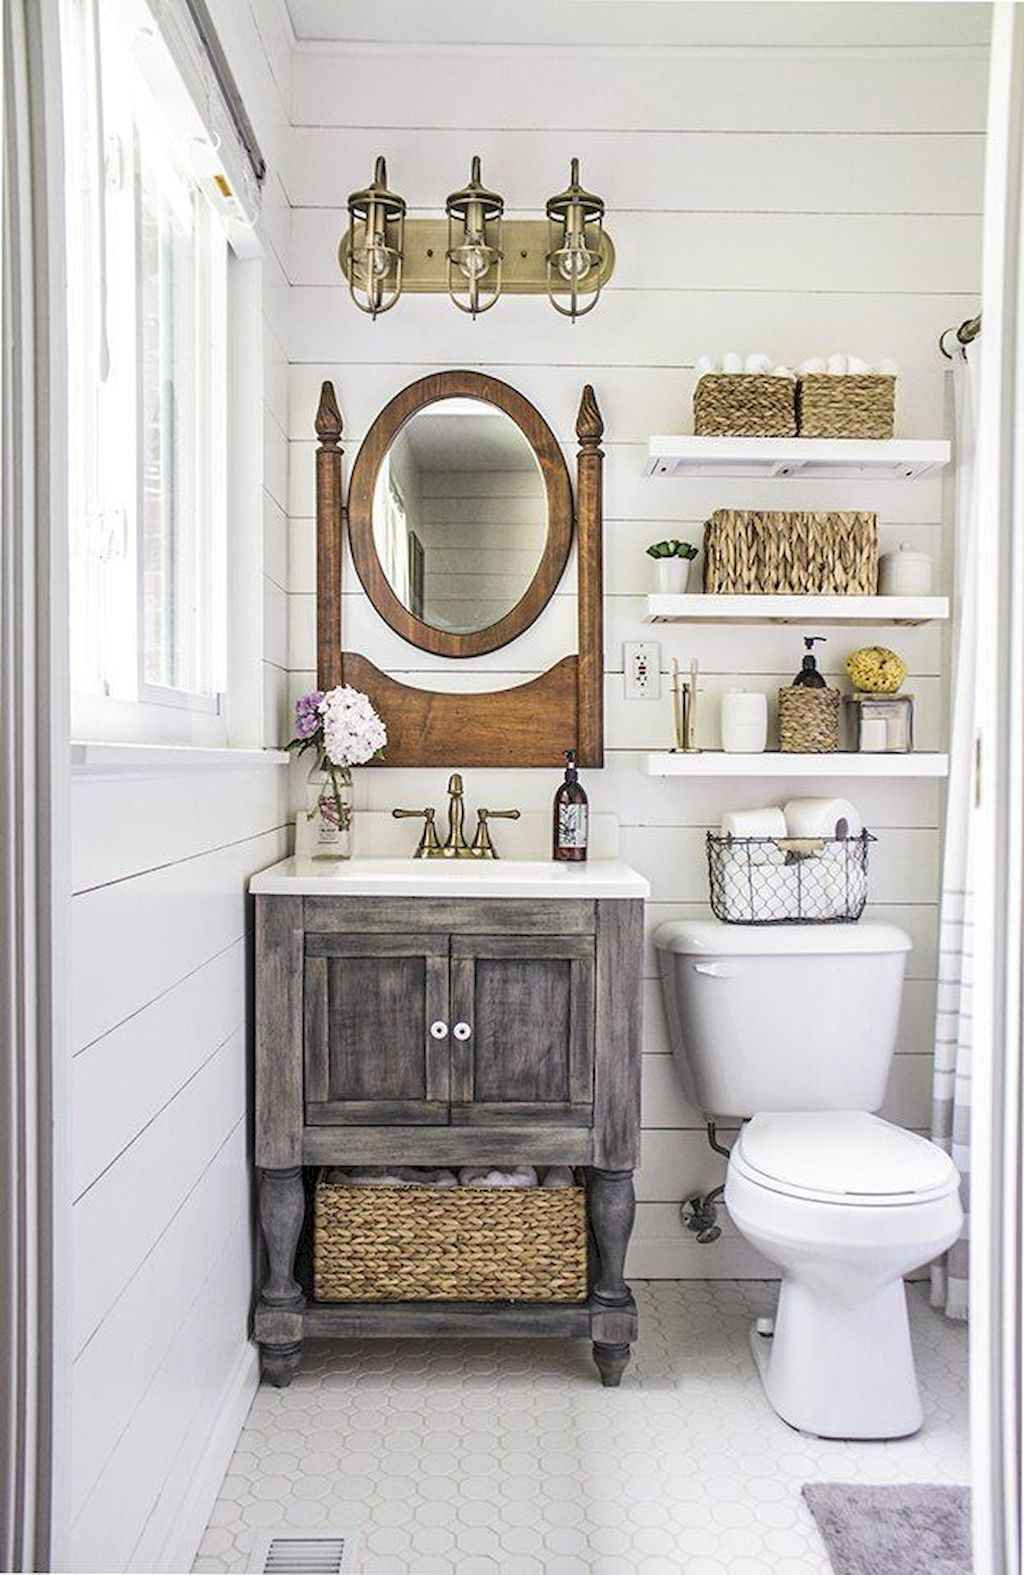 50 Rustic Farmhouse Master Bathroom Remodel Ideas - Roomadness